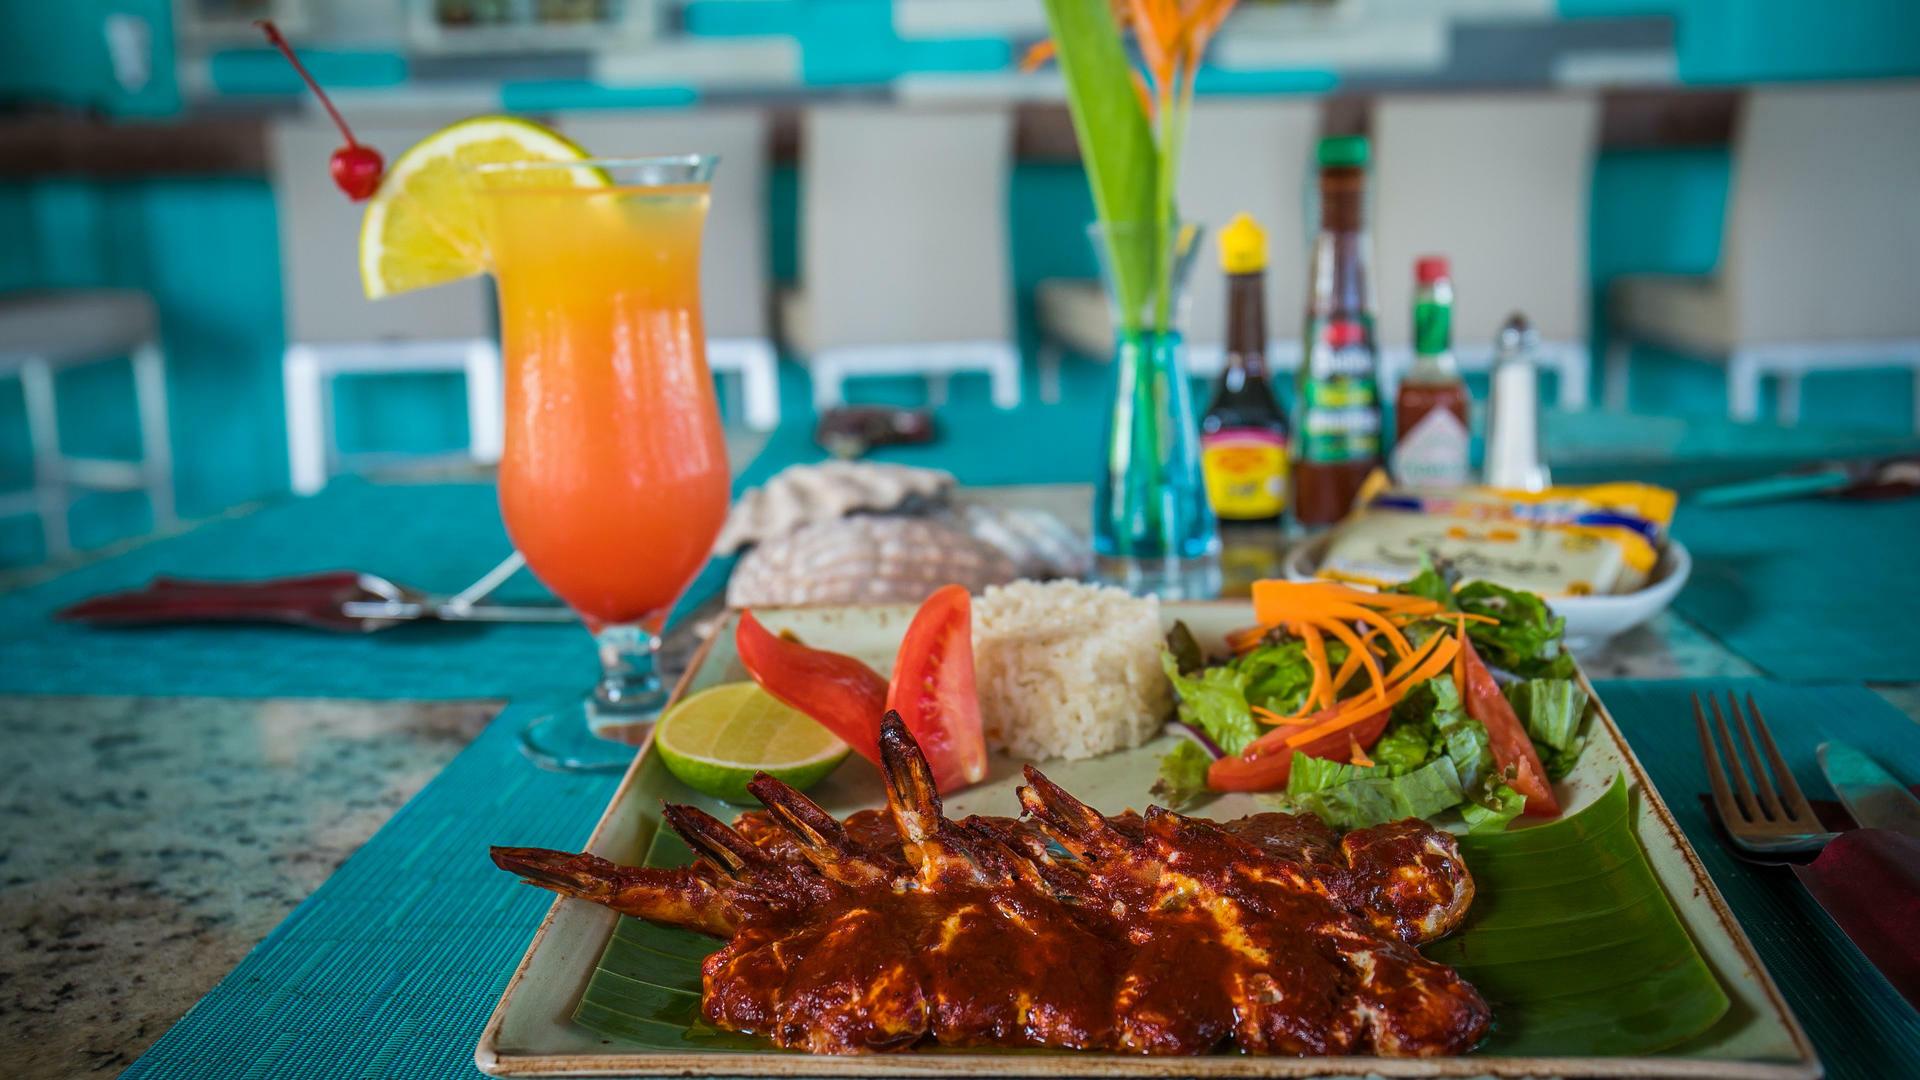 A prawn dish served at Acua Restaurant in Mundo Imperial